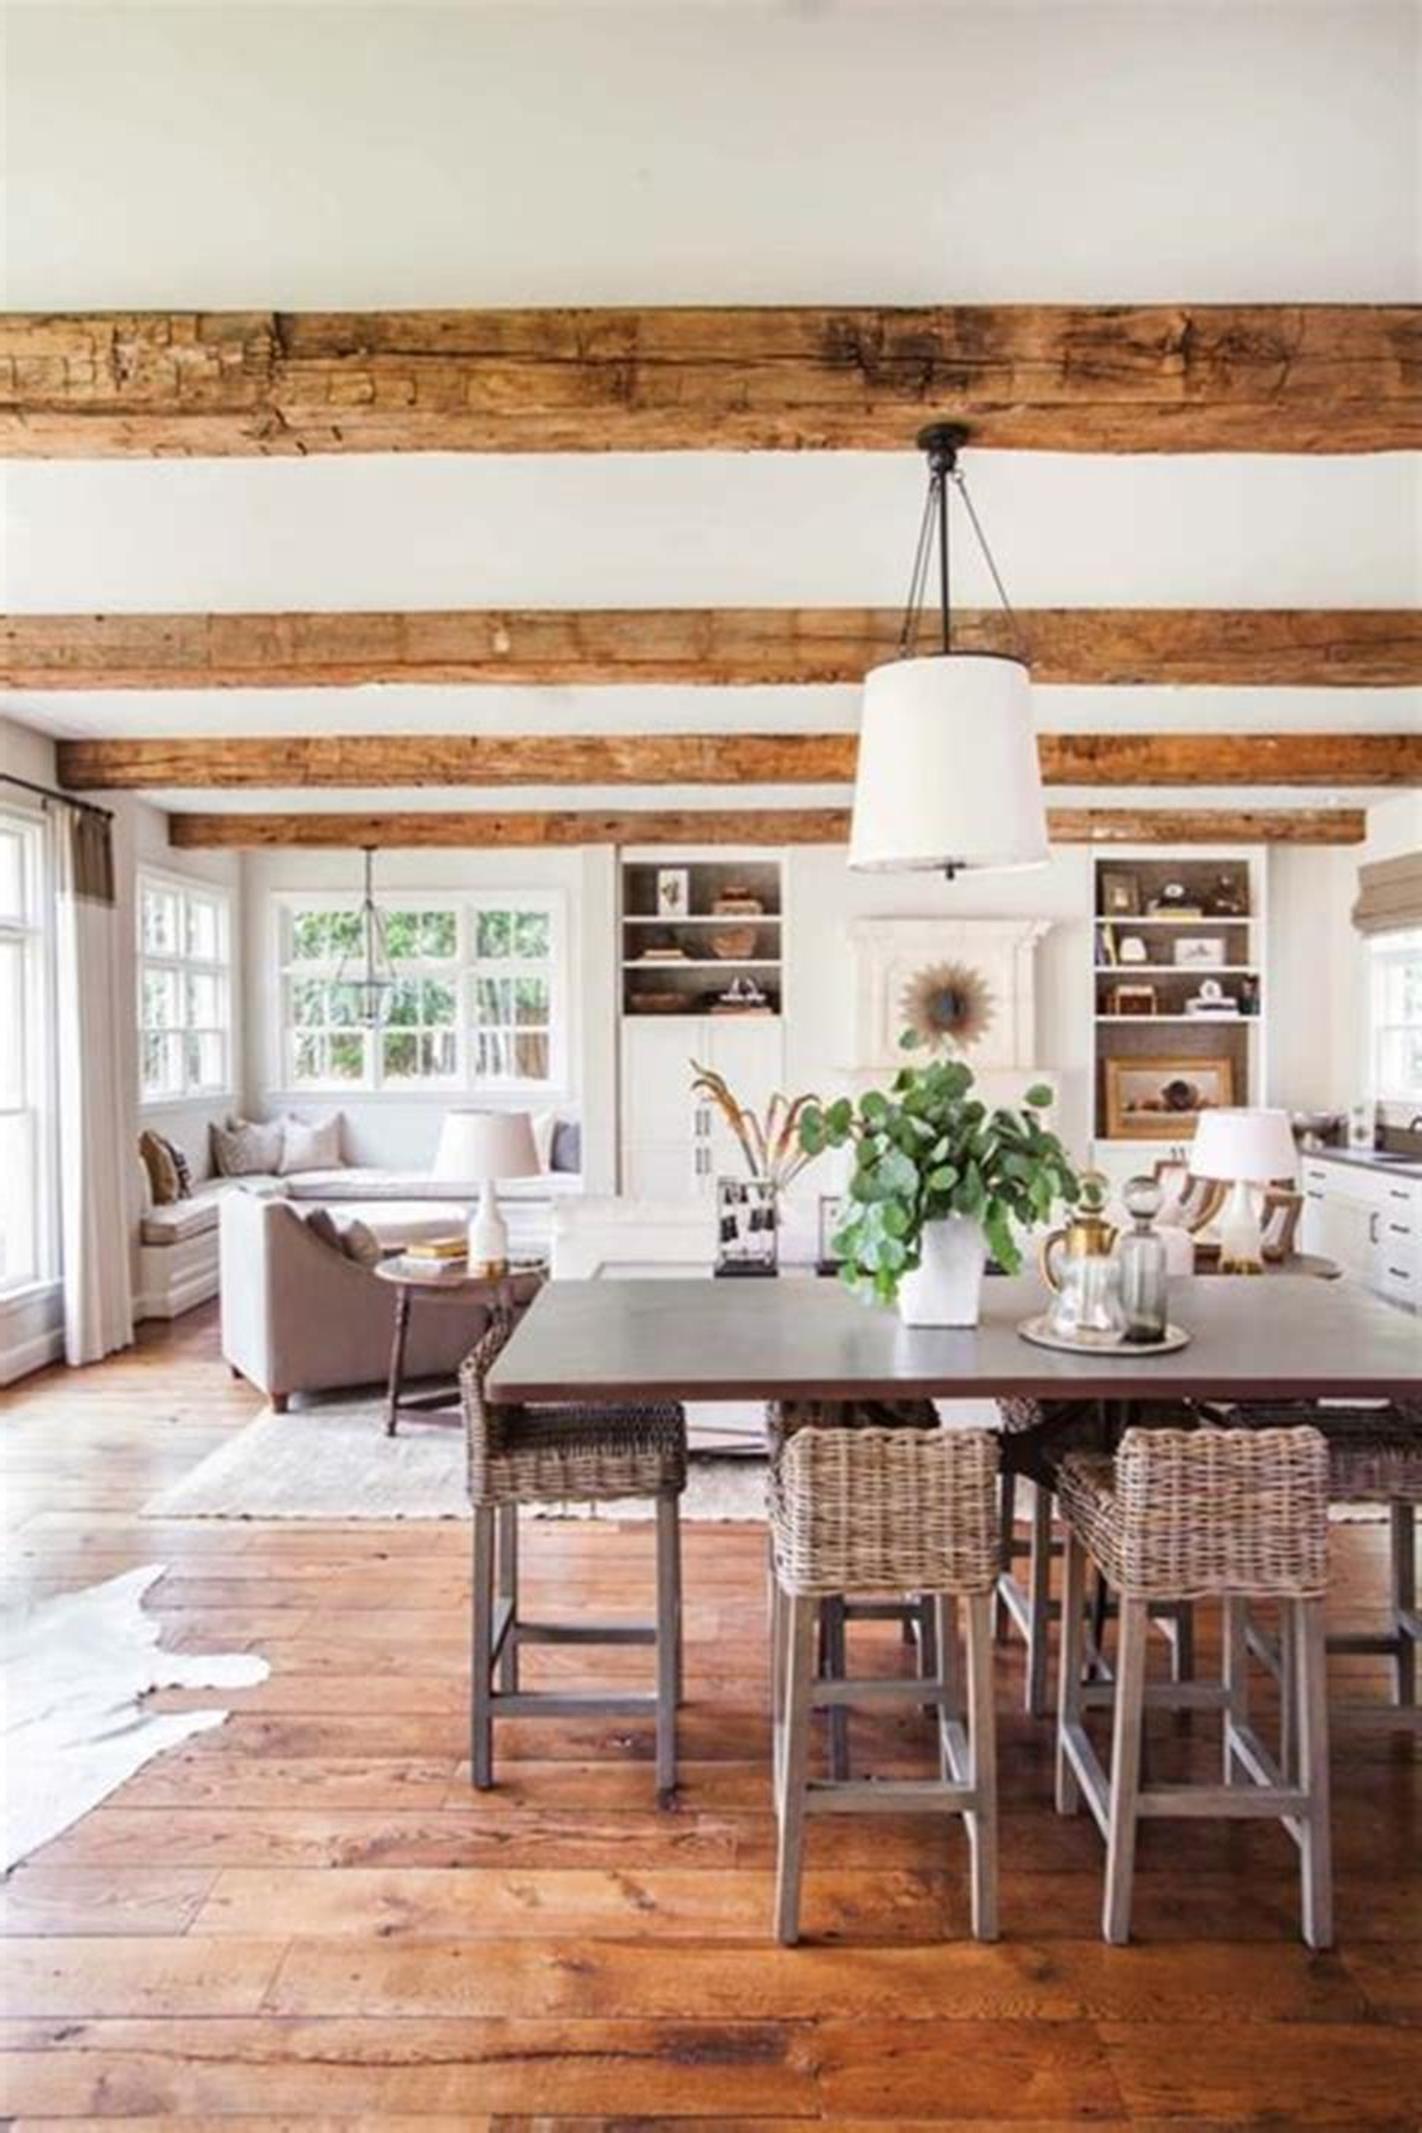 31 Amazing Modern Farmhouse Interior Design Ideas 23 ...